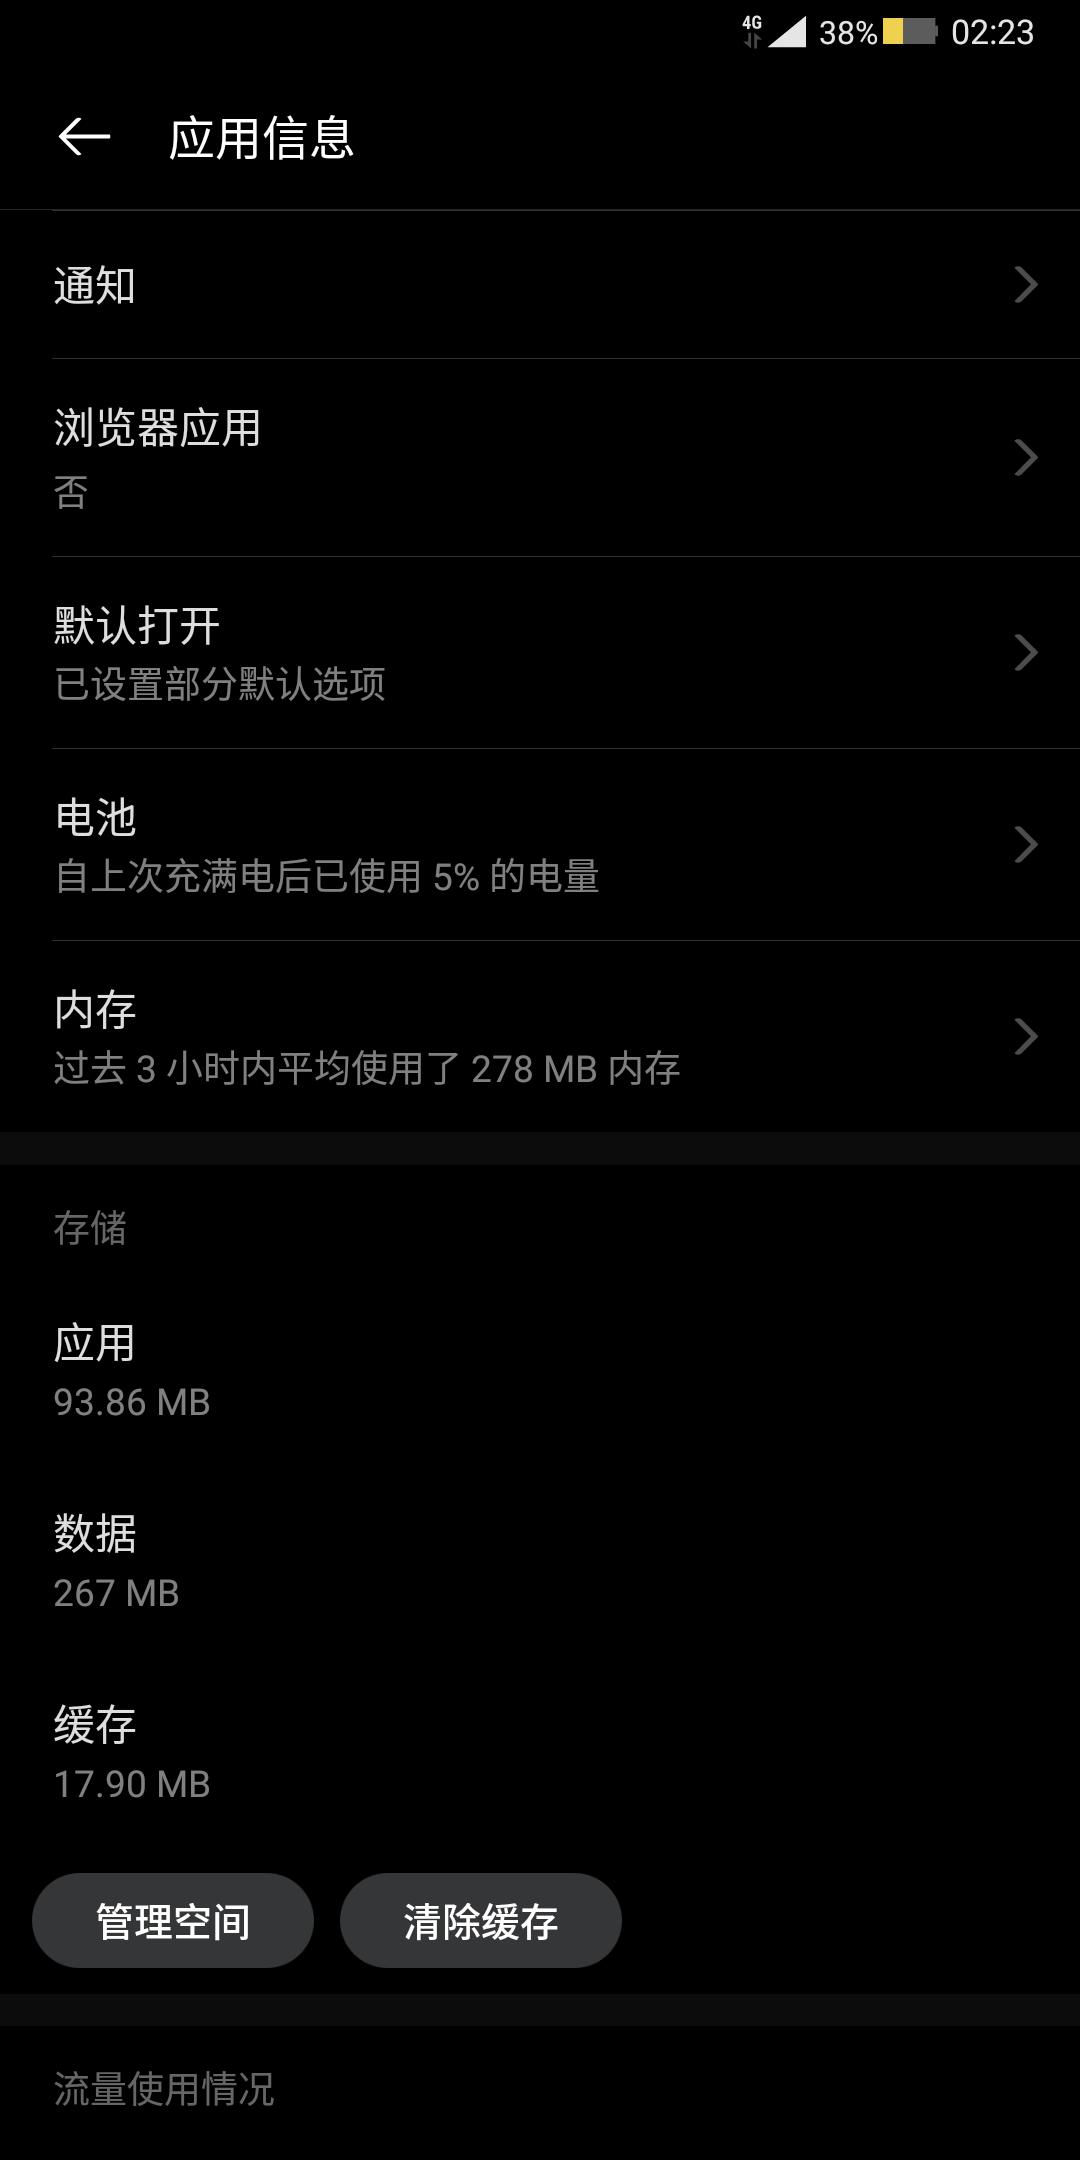 Screenshot_2019-07-15-02-23-04-756_com.android.se.png